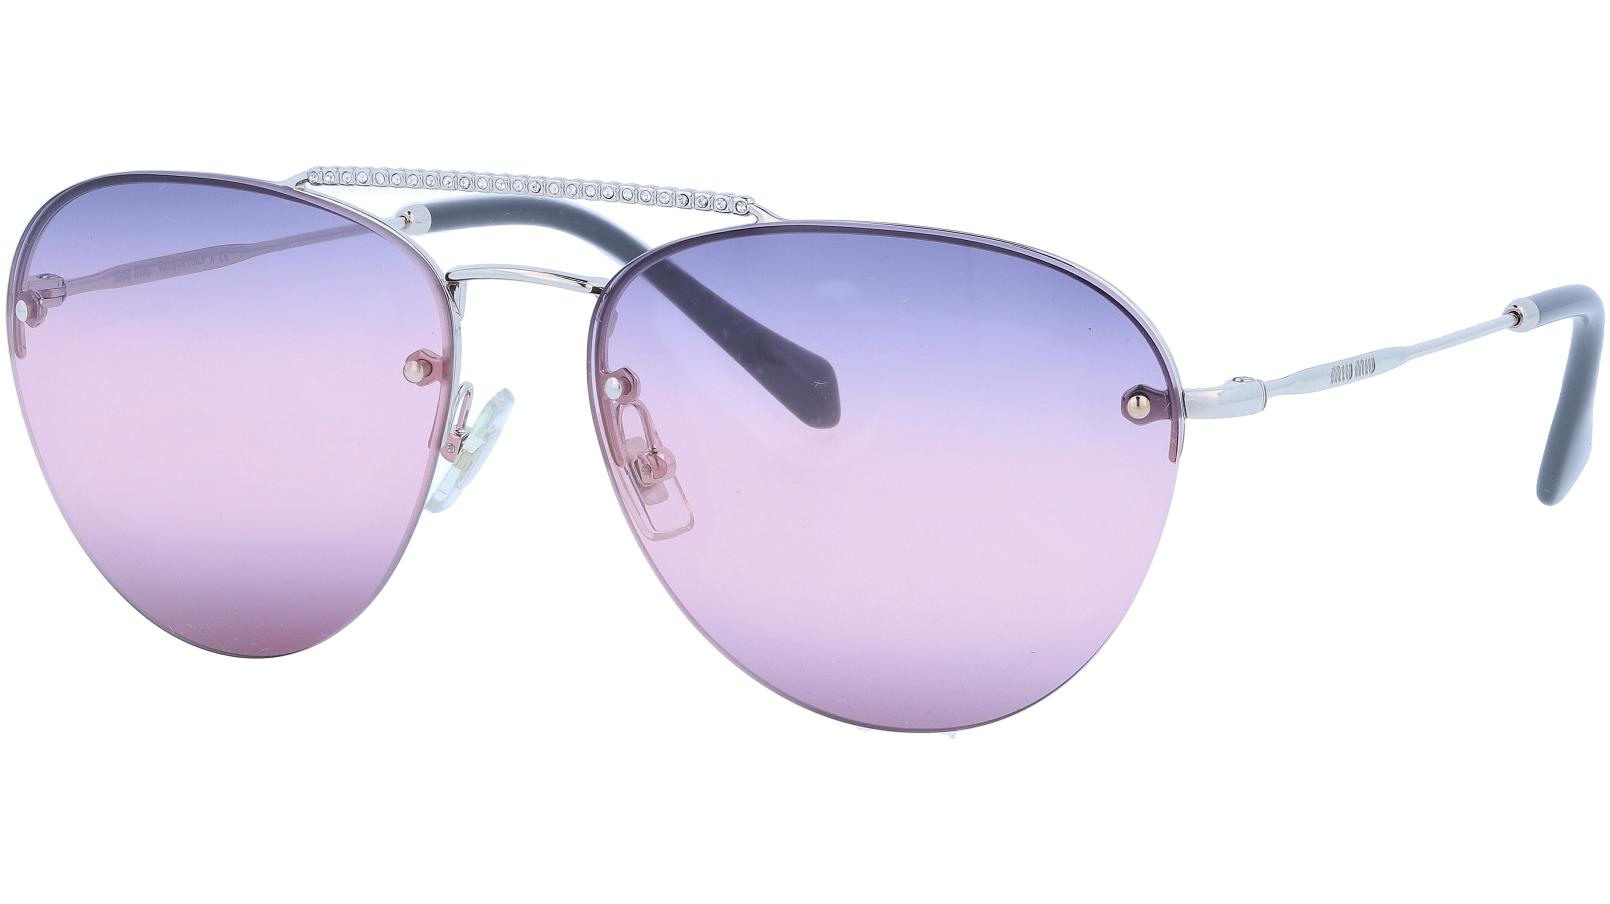 MIU MIU MU54US 1BC157 59 Purple Sunglasses